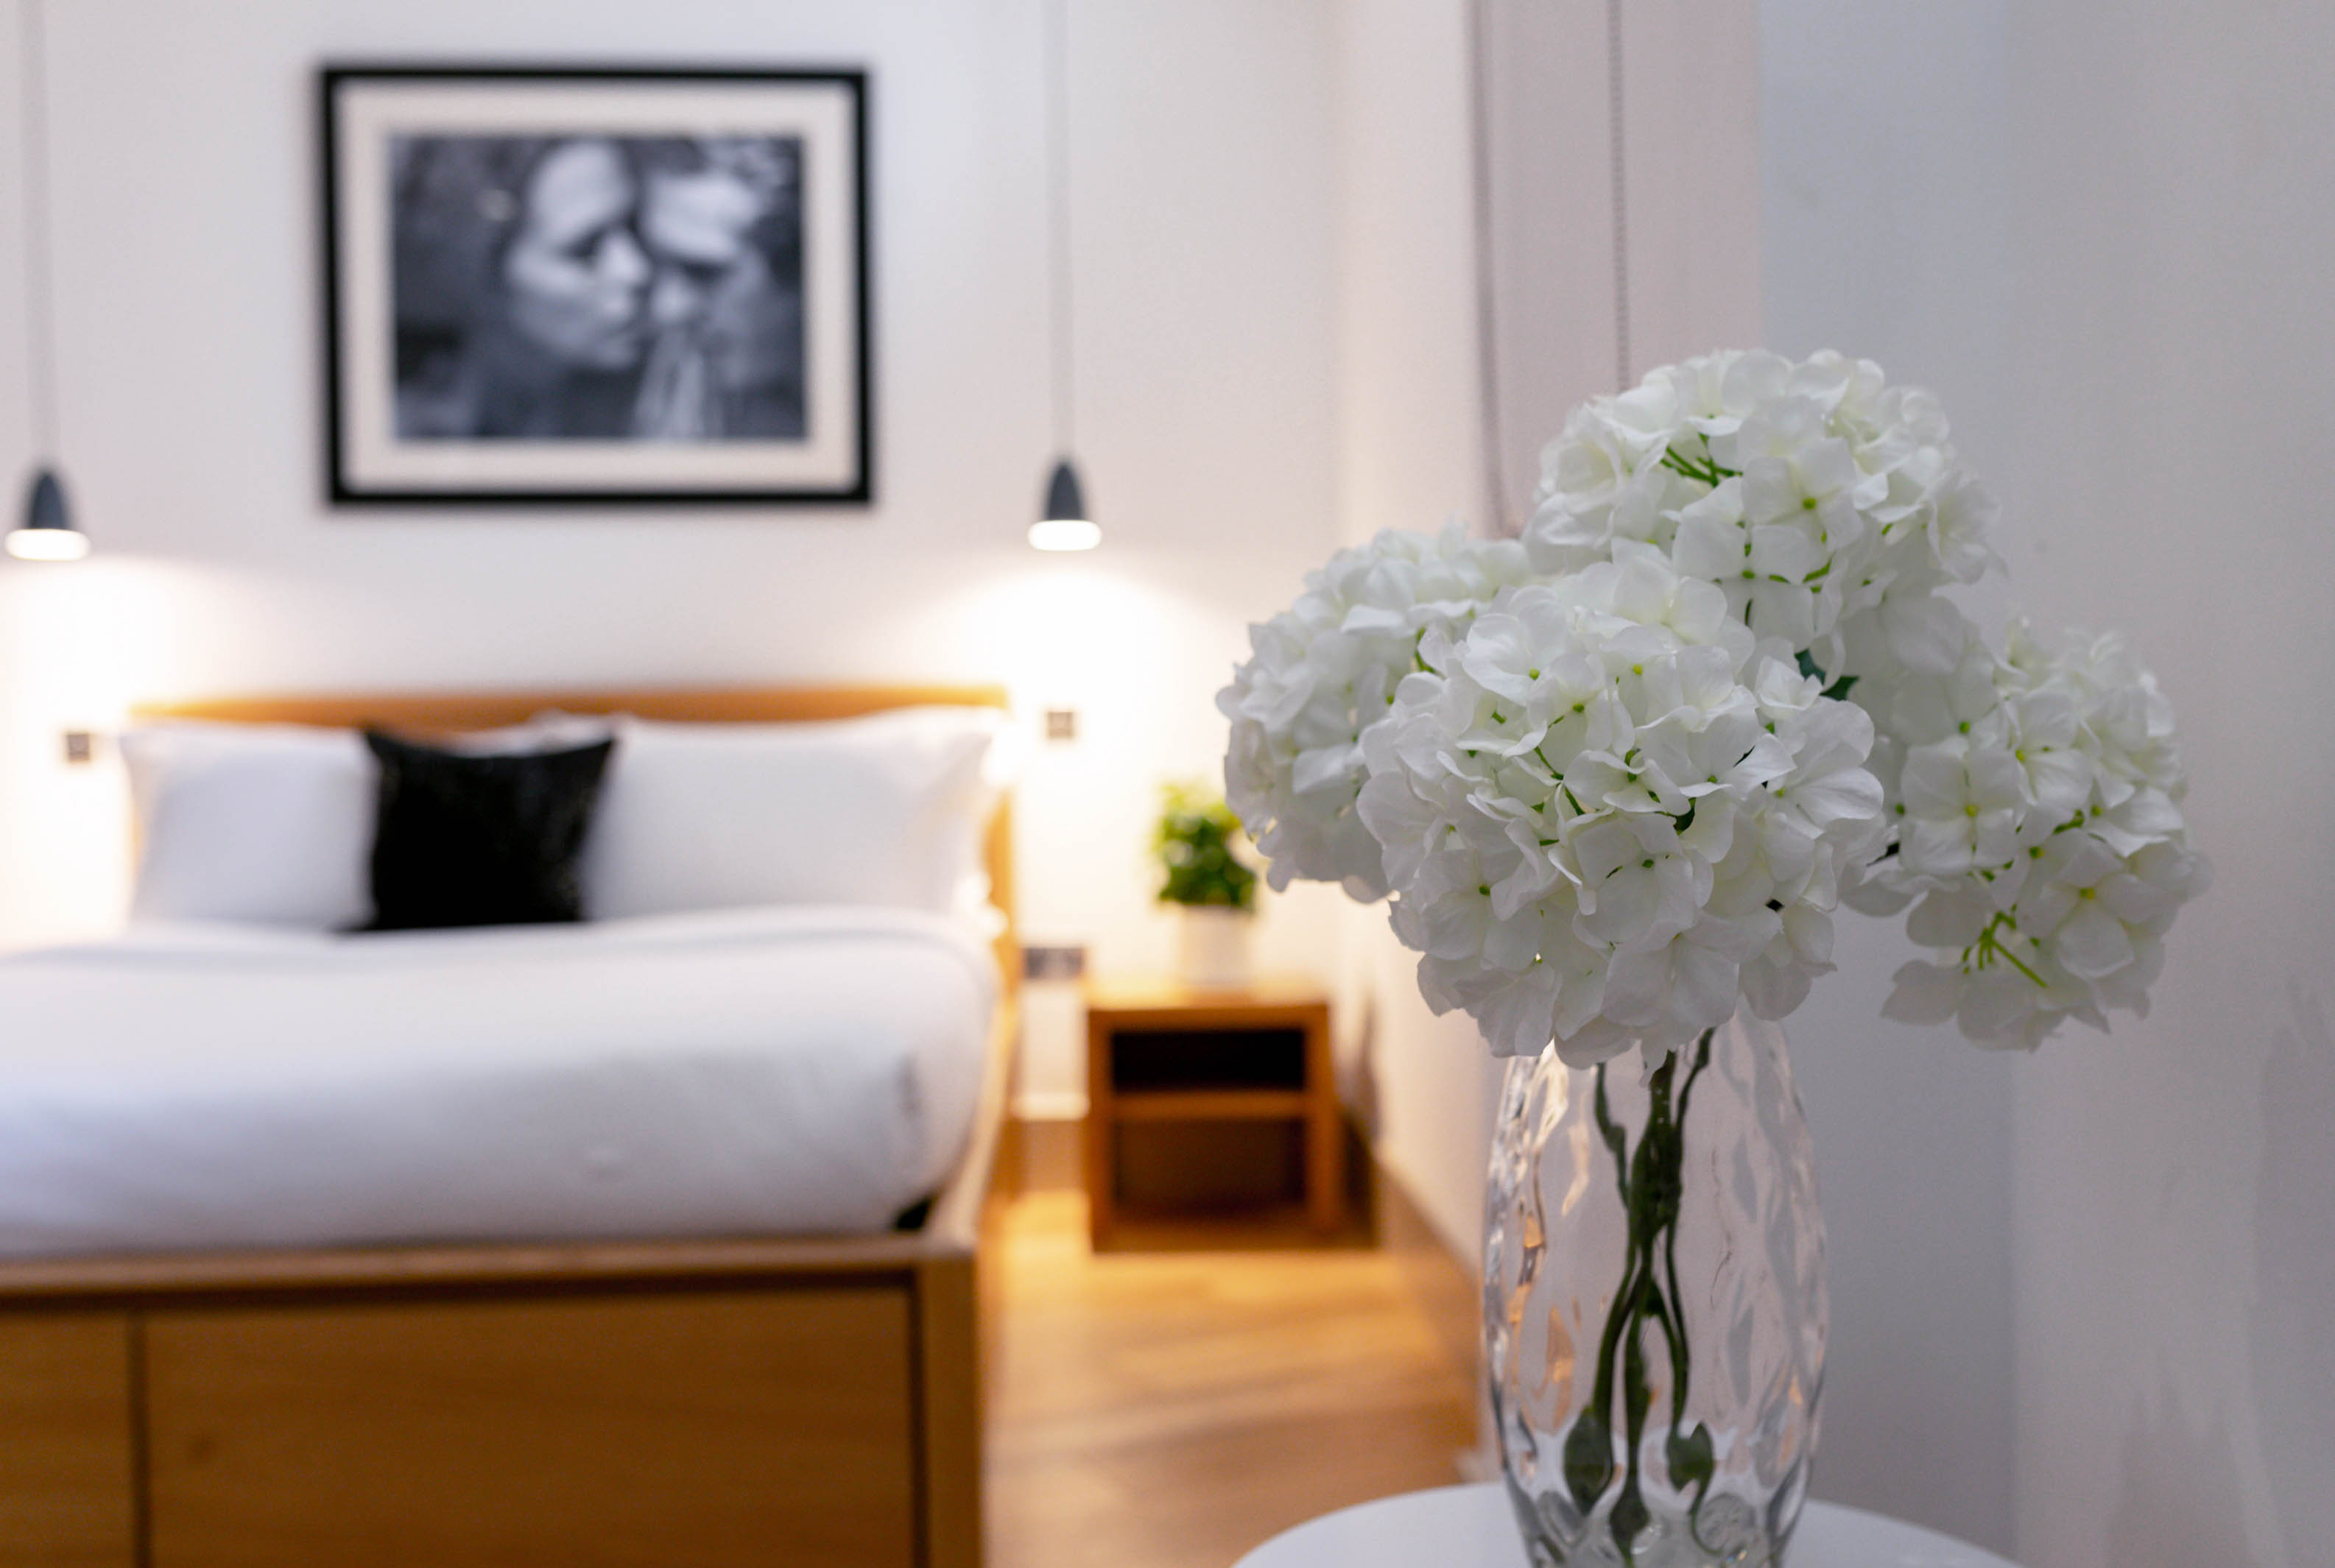 Lovelydays luxury service apartment rental - London - Fitzrovia - Wells Mews B - Lovelysuite - 2 bedrooms - 2 bathrooms - Double bed - 6f2064967ead - Lovelydays